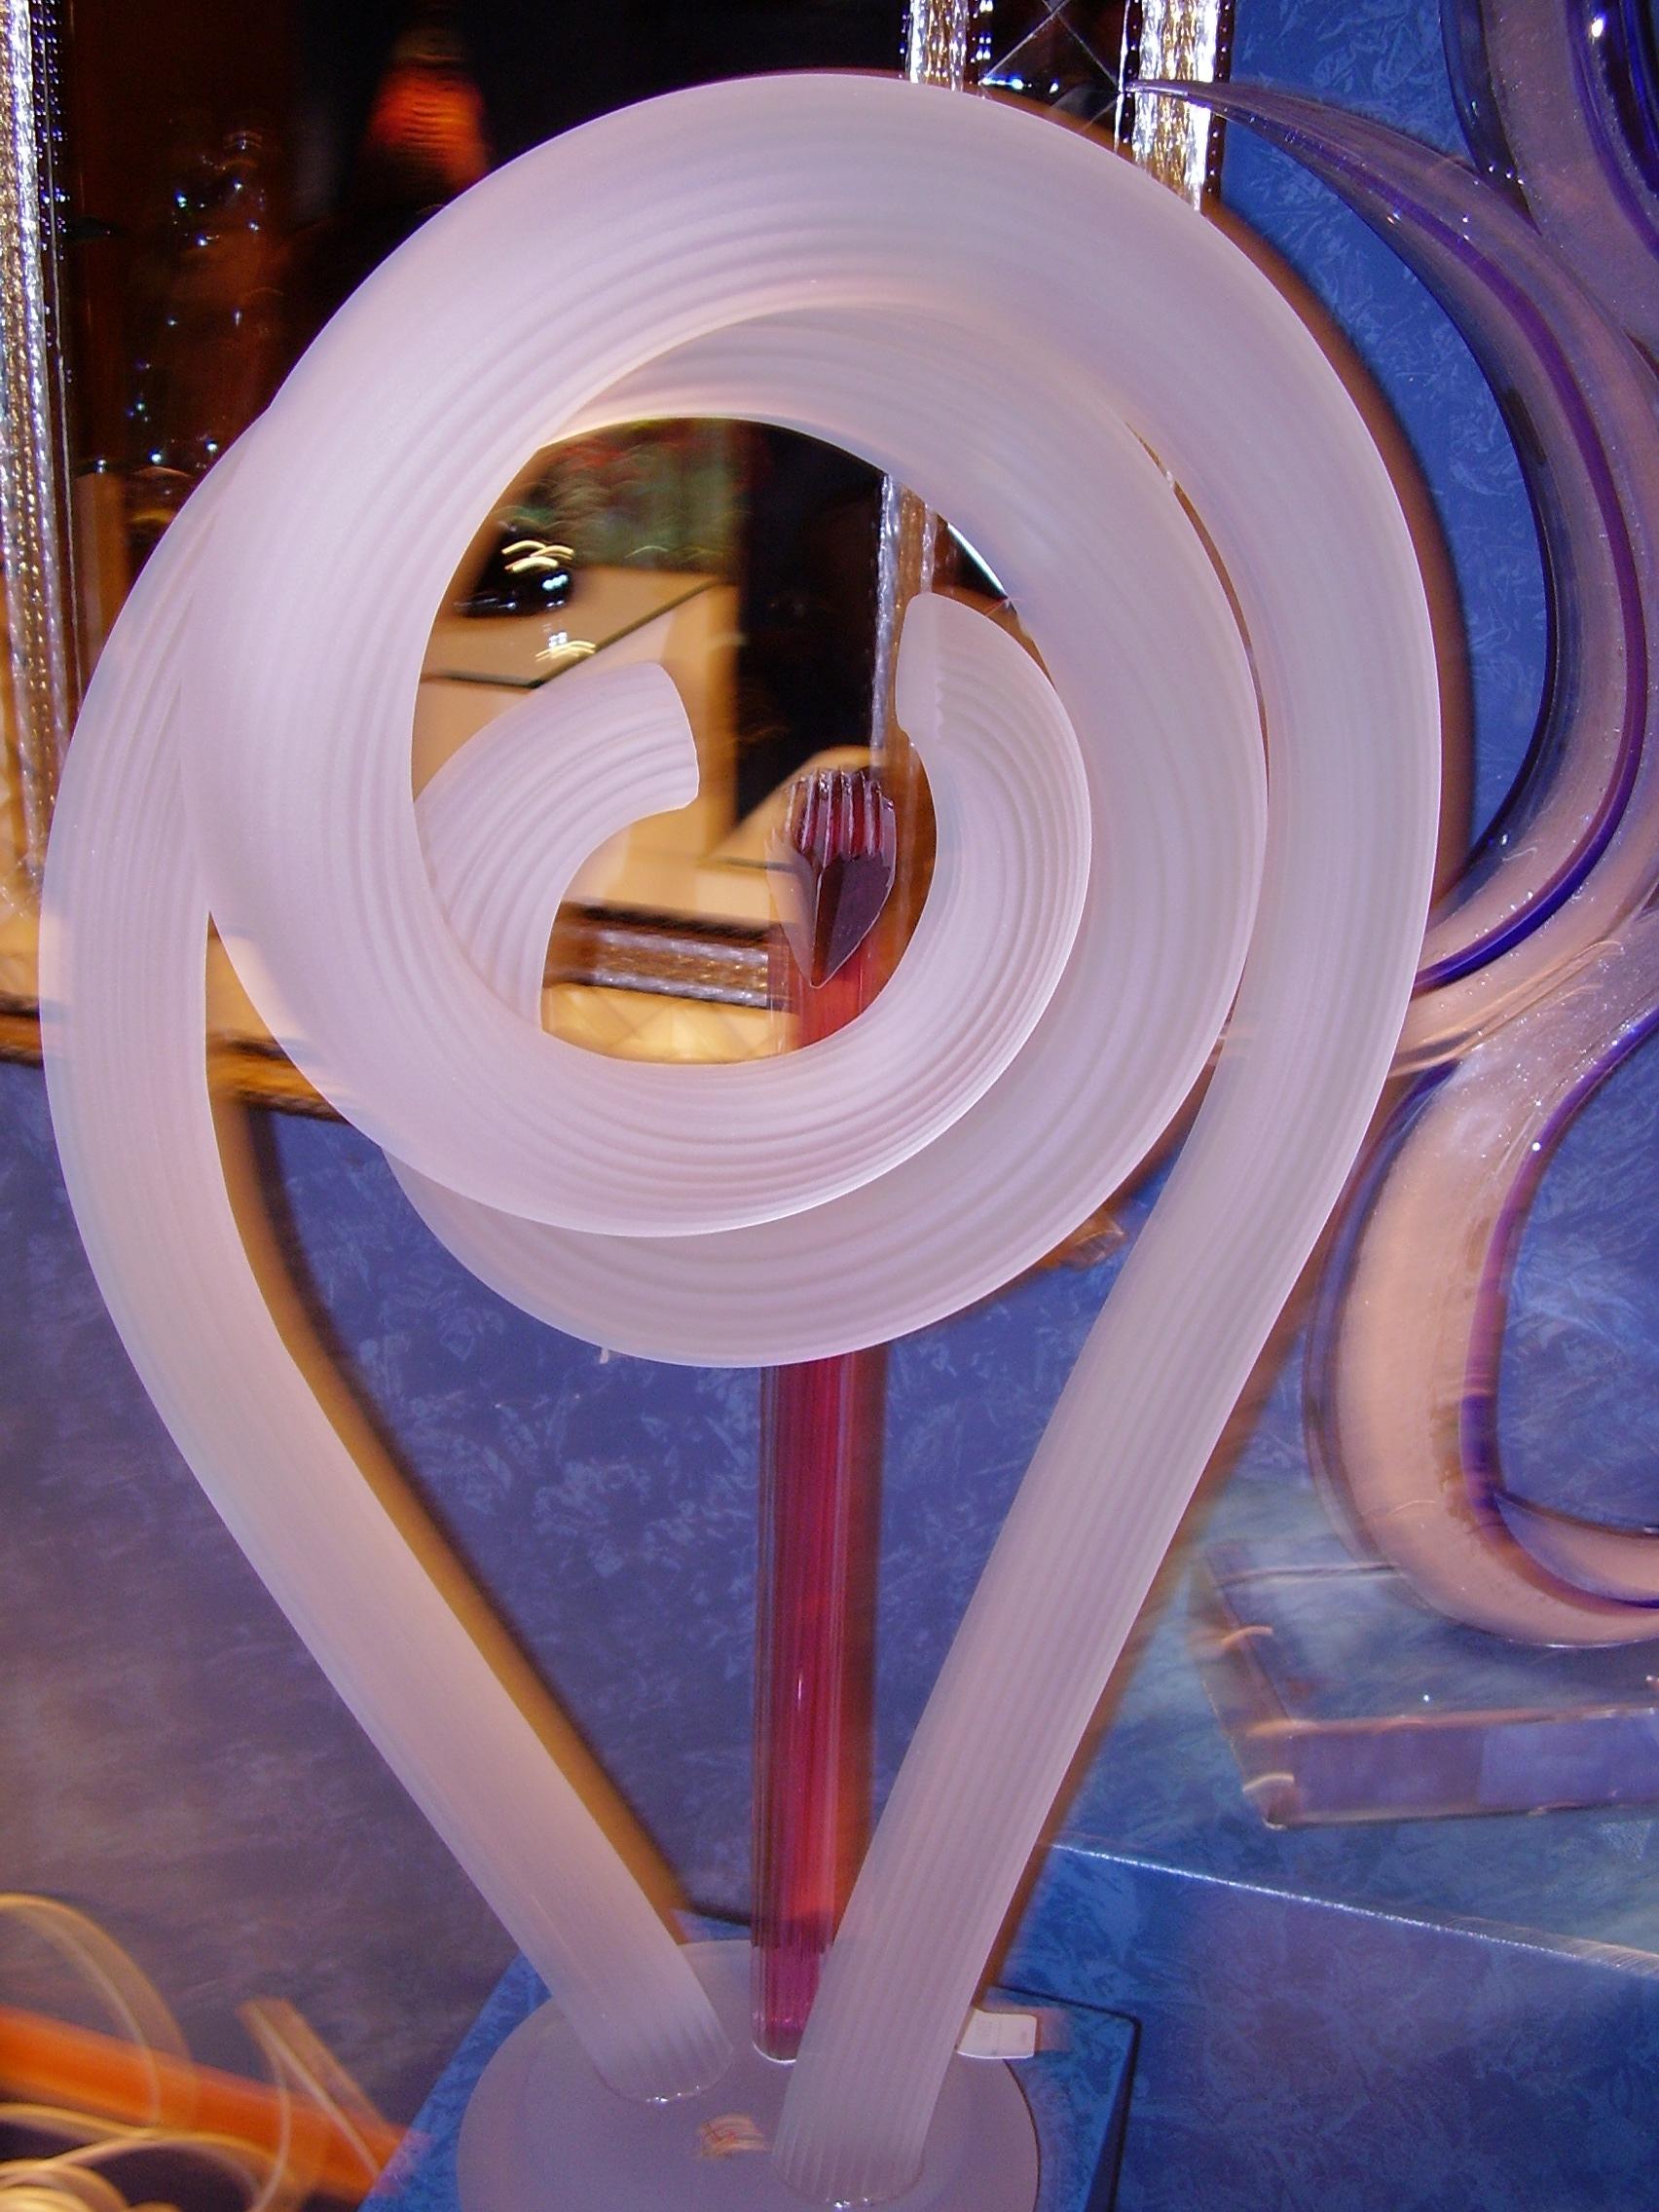 Glass modern art in Venice